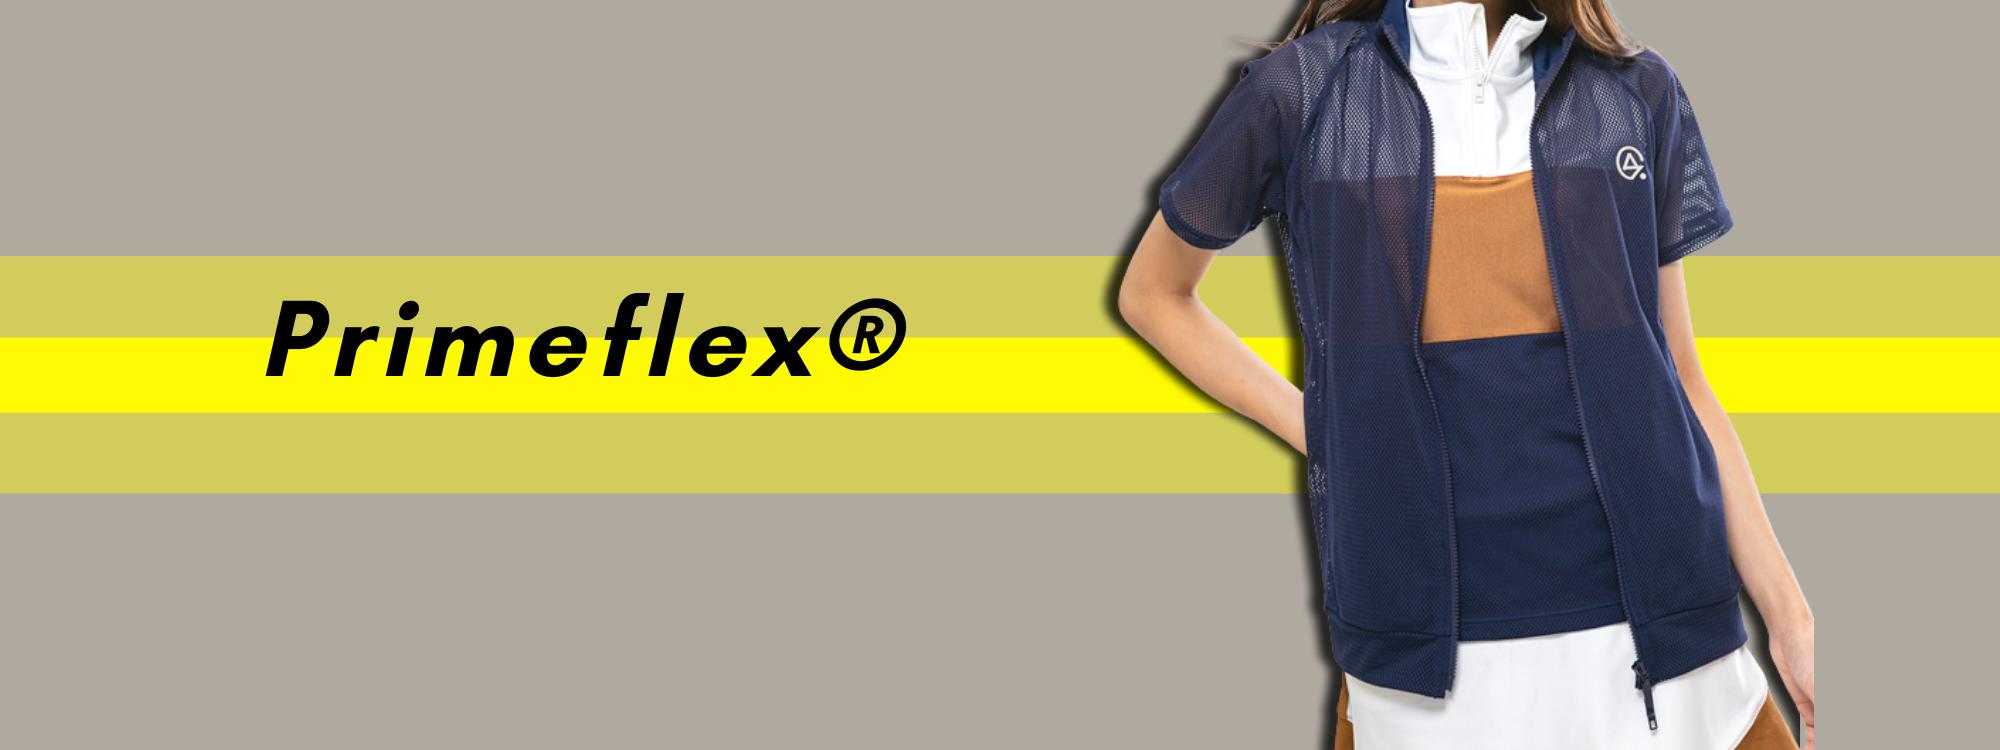 Primeflex